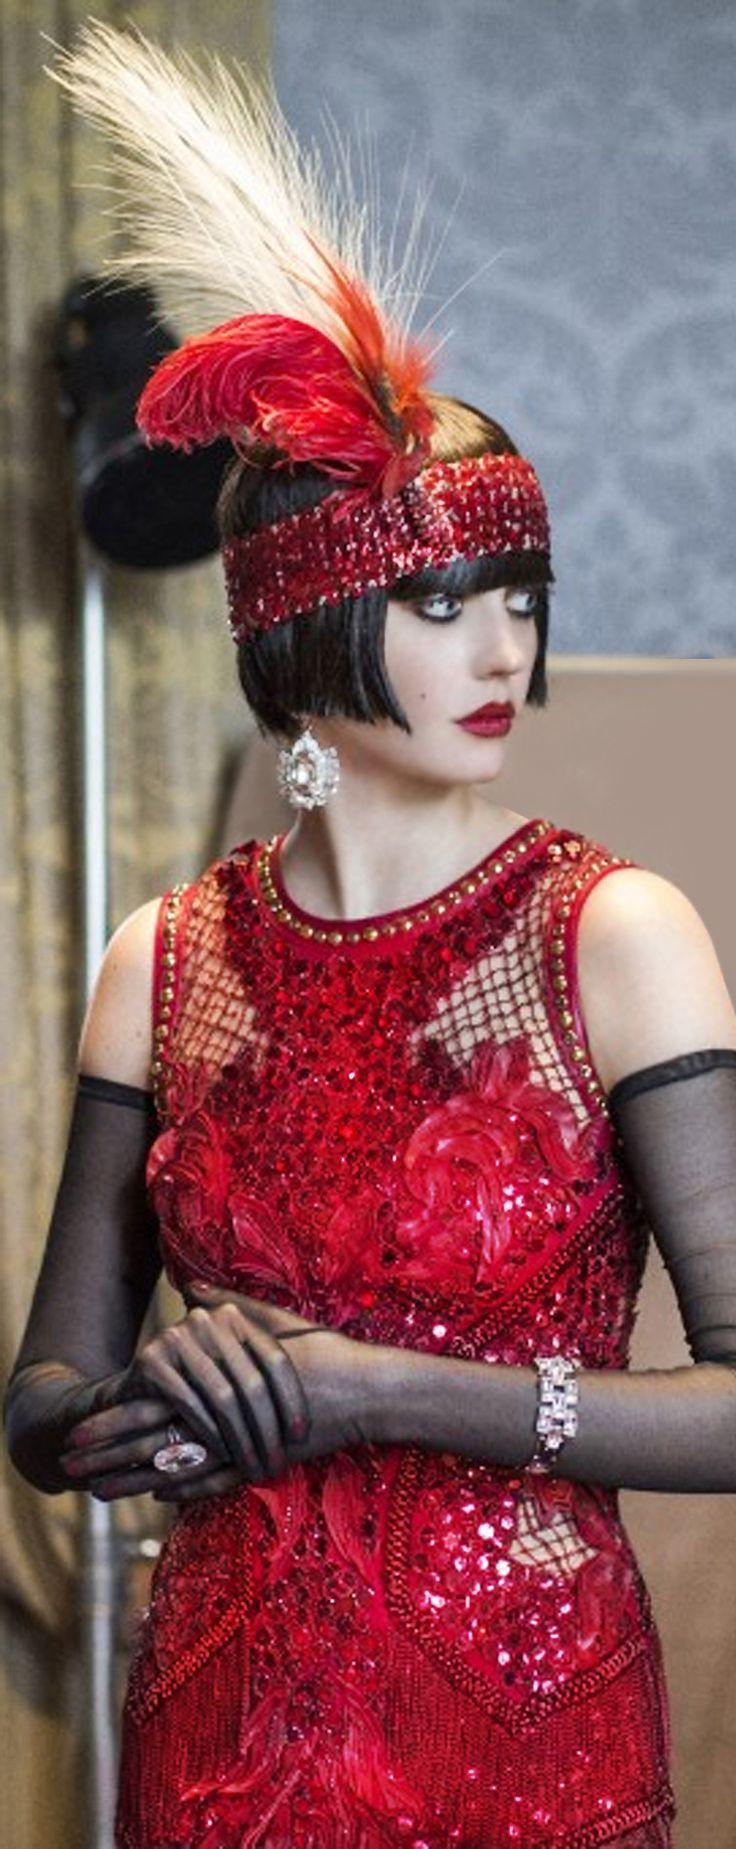 Fashion in the roaring 20s 485 best Fractal and Digital Art images on Pinterest Fractal art